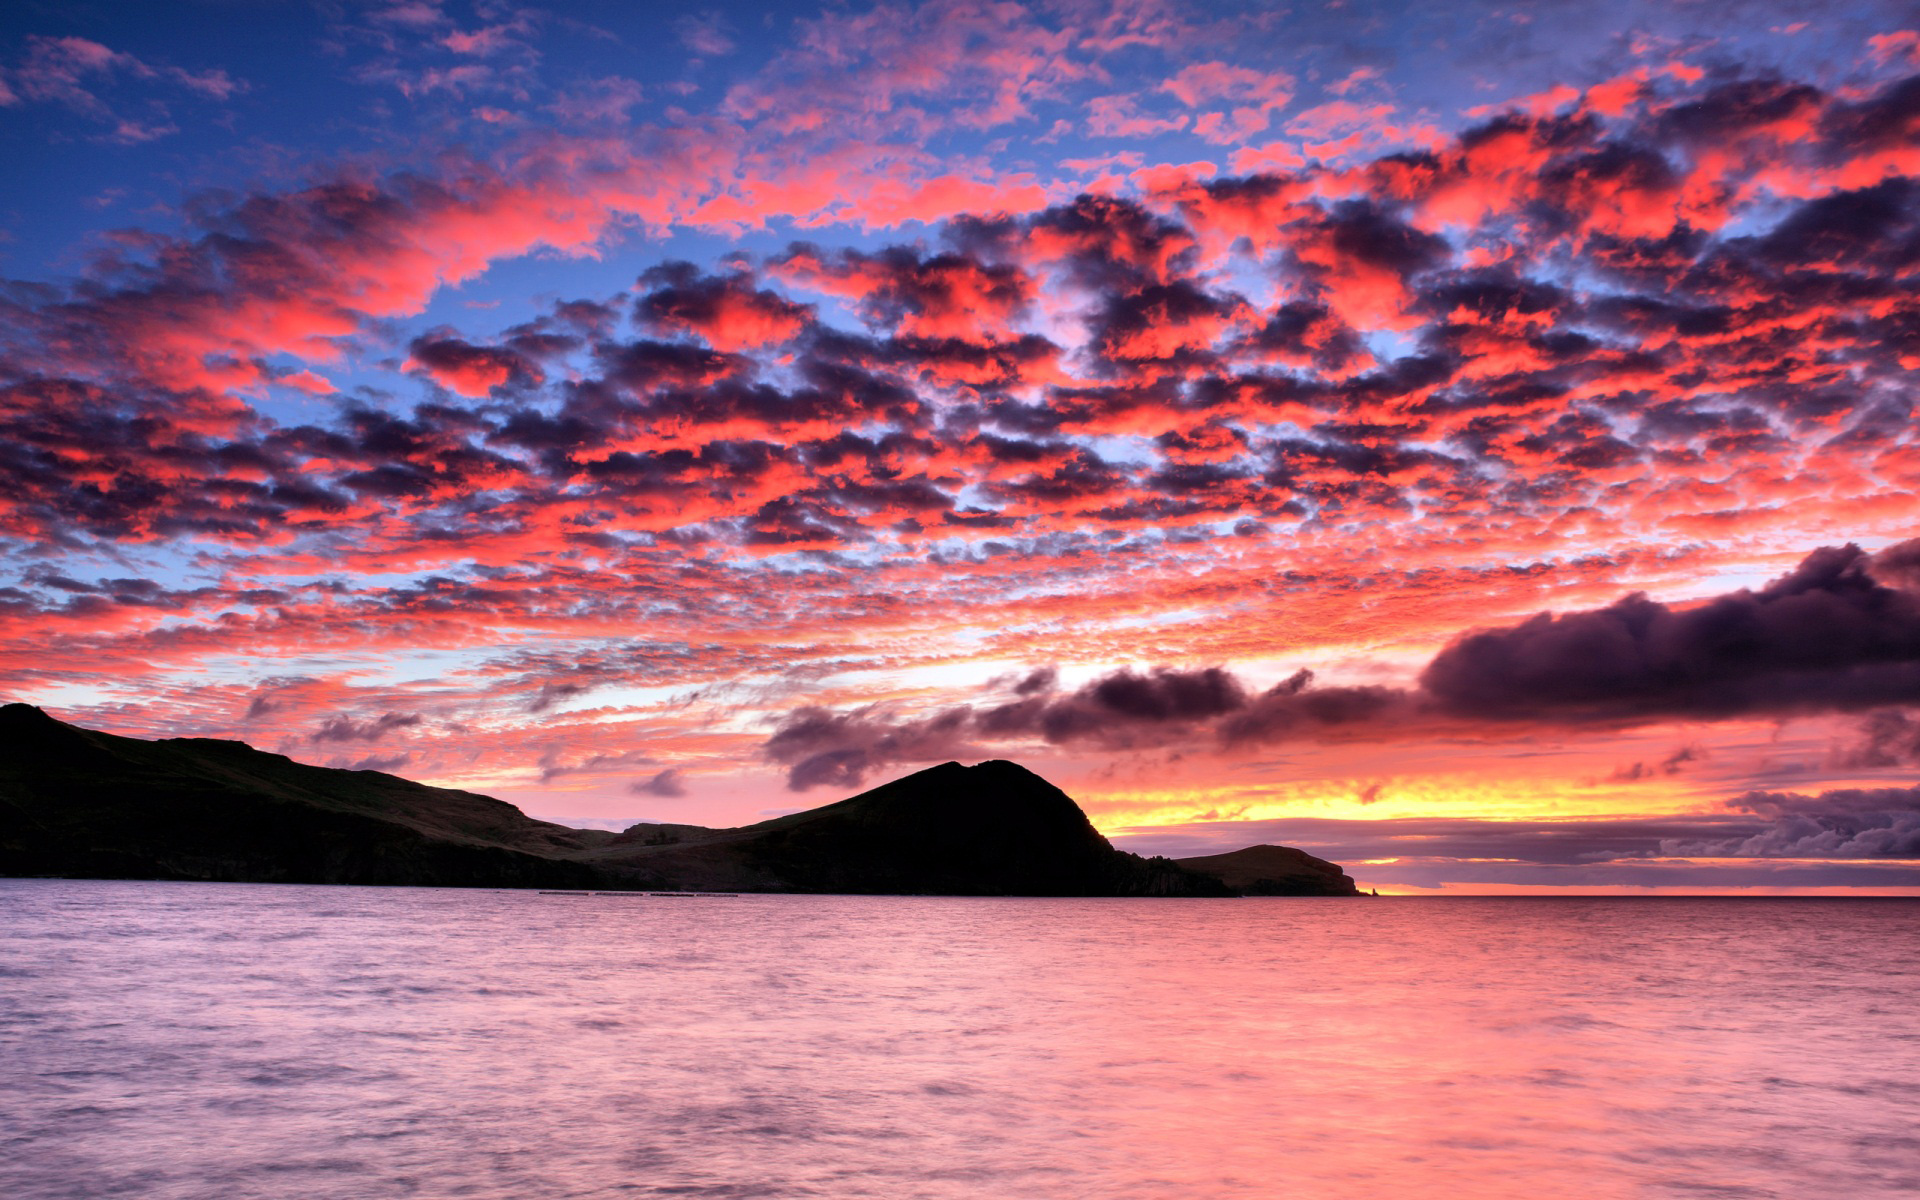 pink sunset background 30026